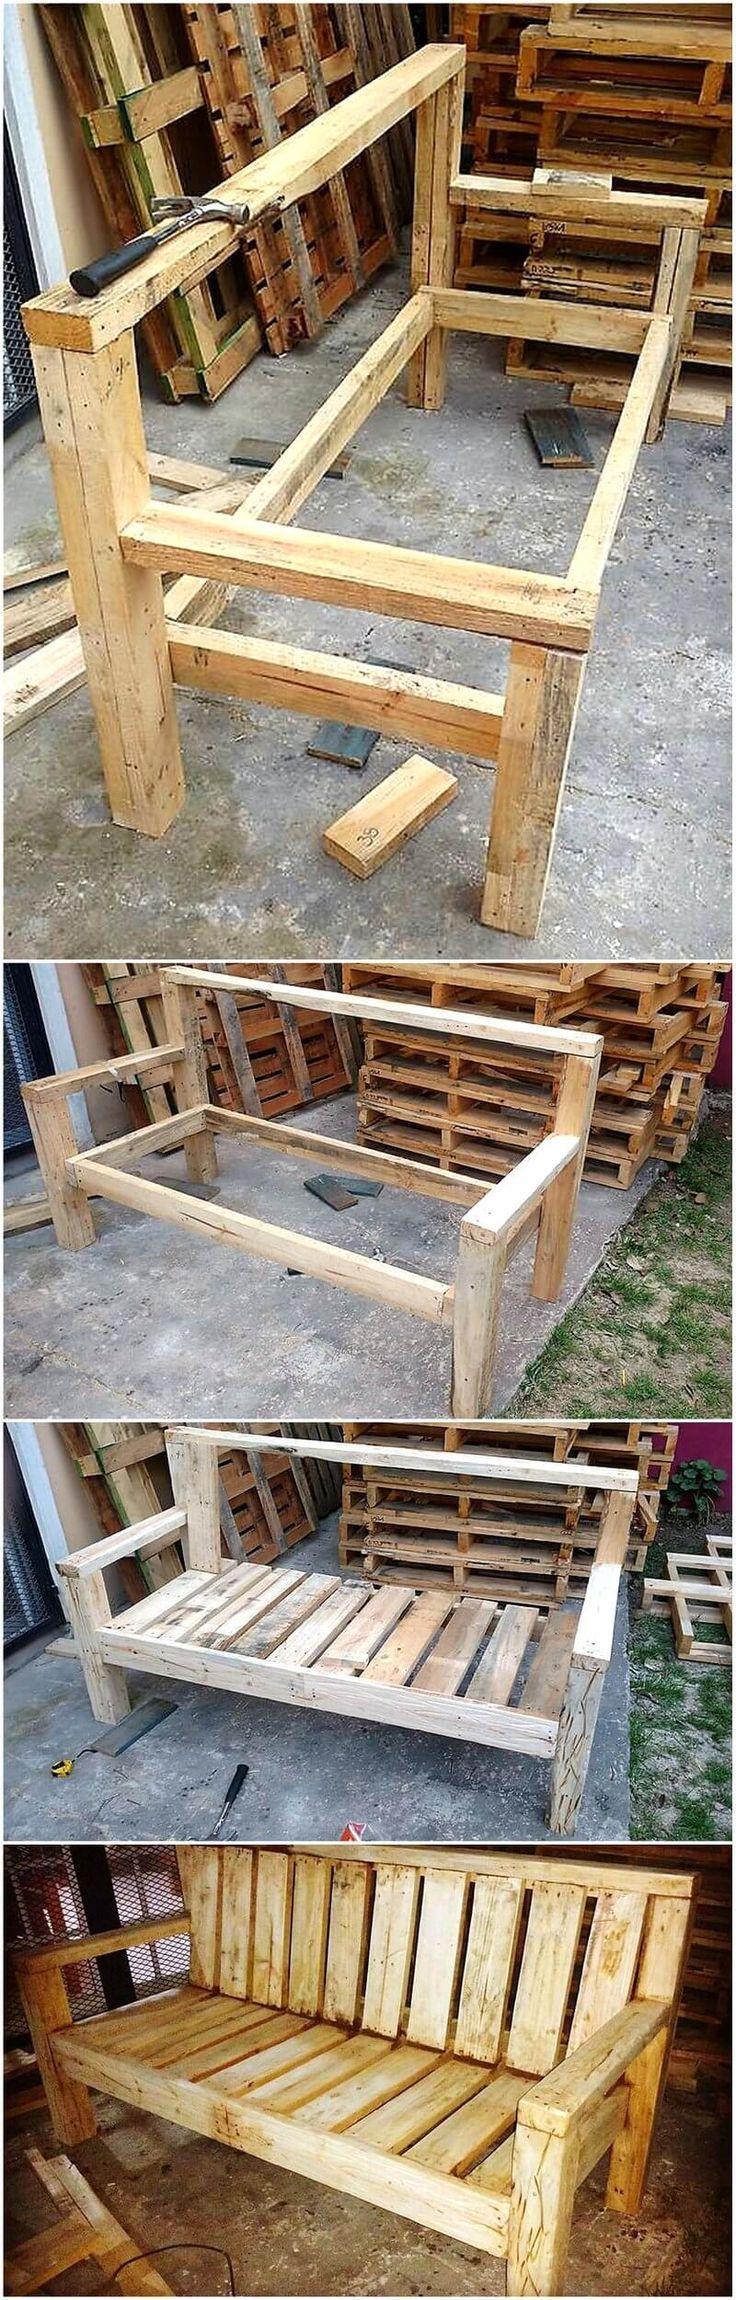 DIY Recycled Wood Pallet Bench Plan